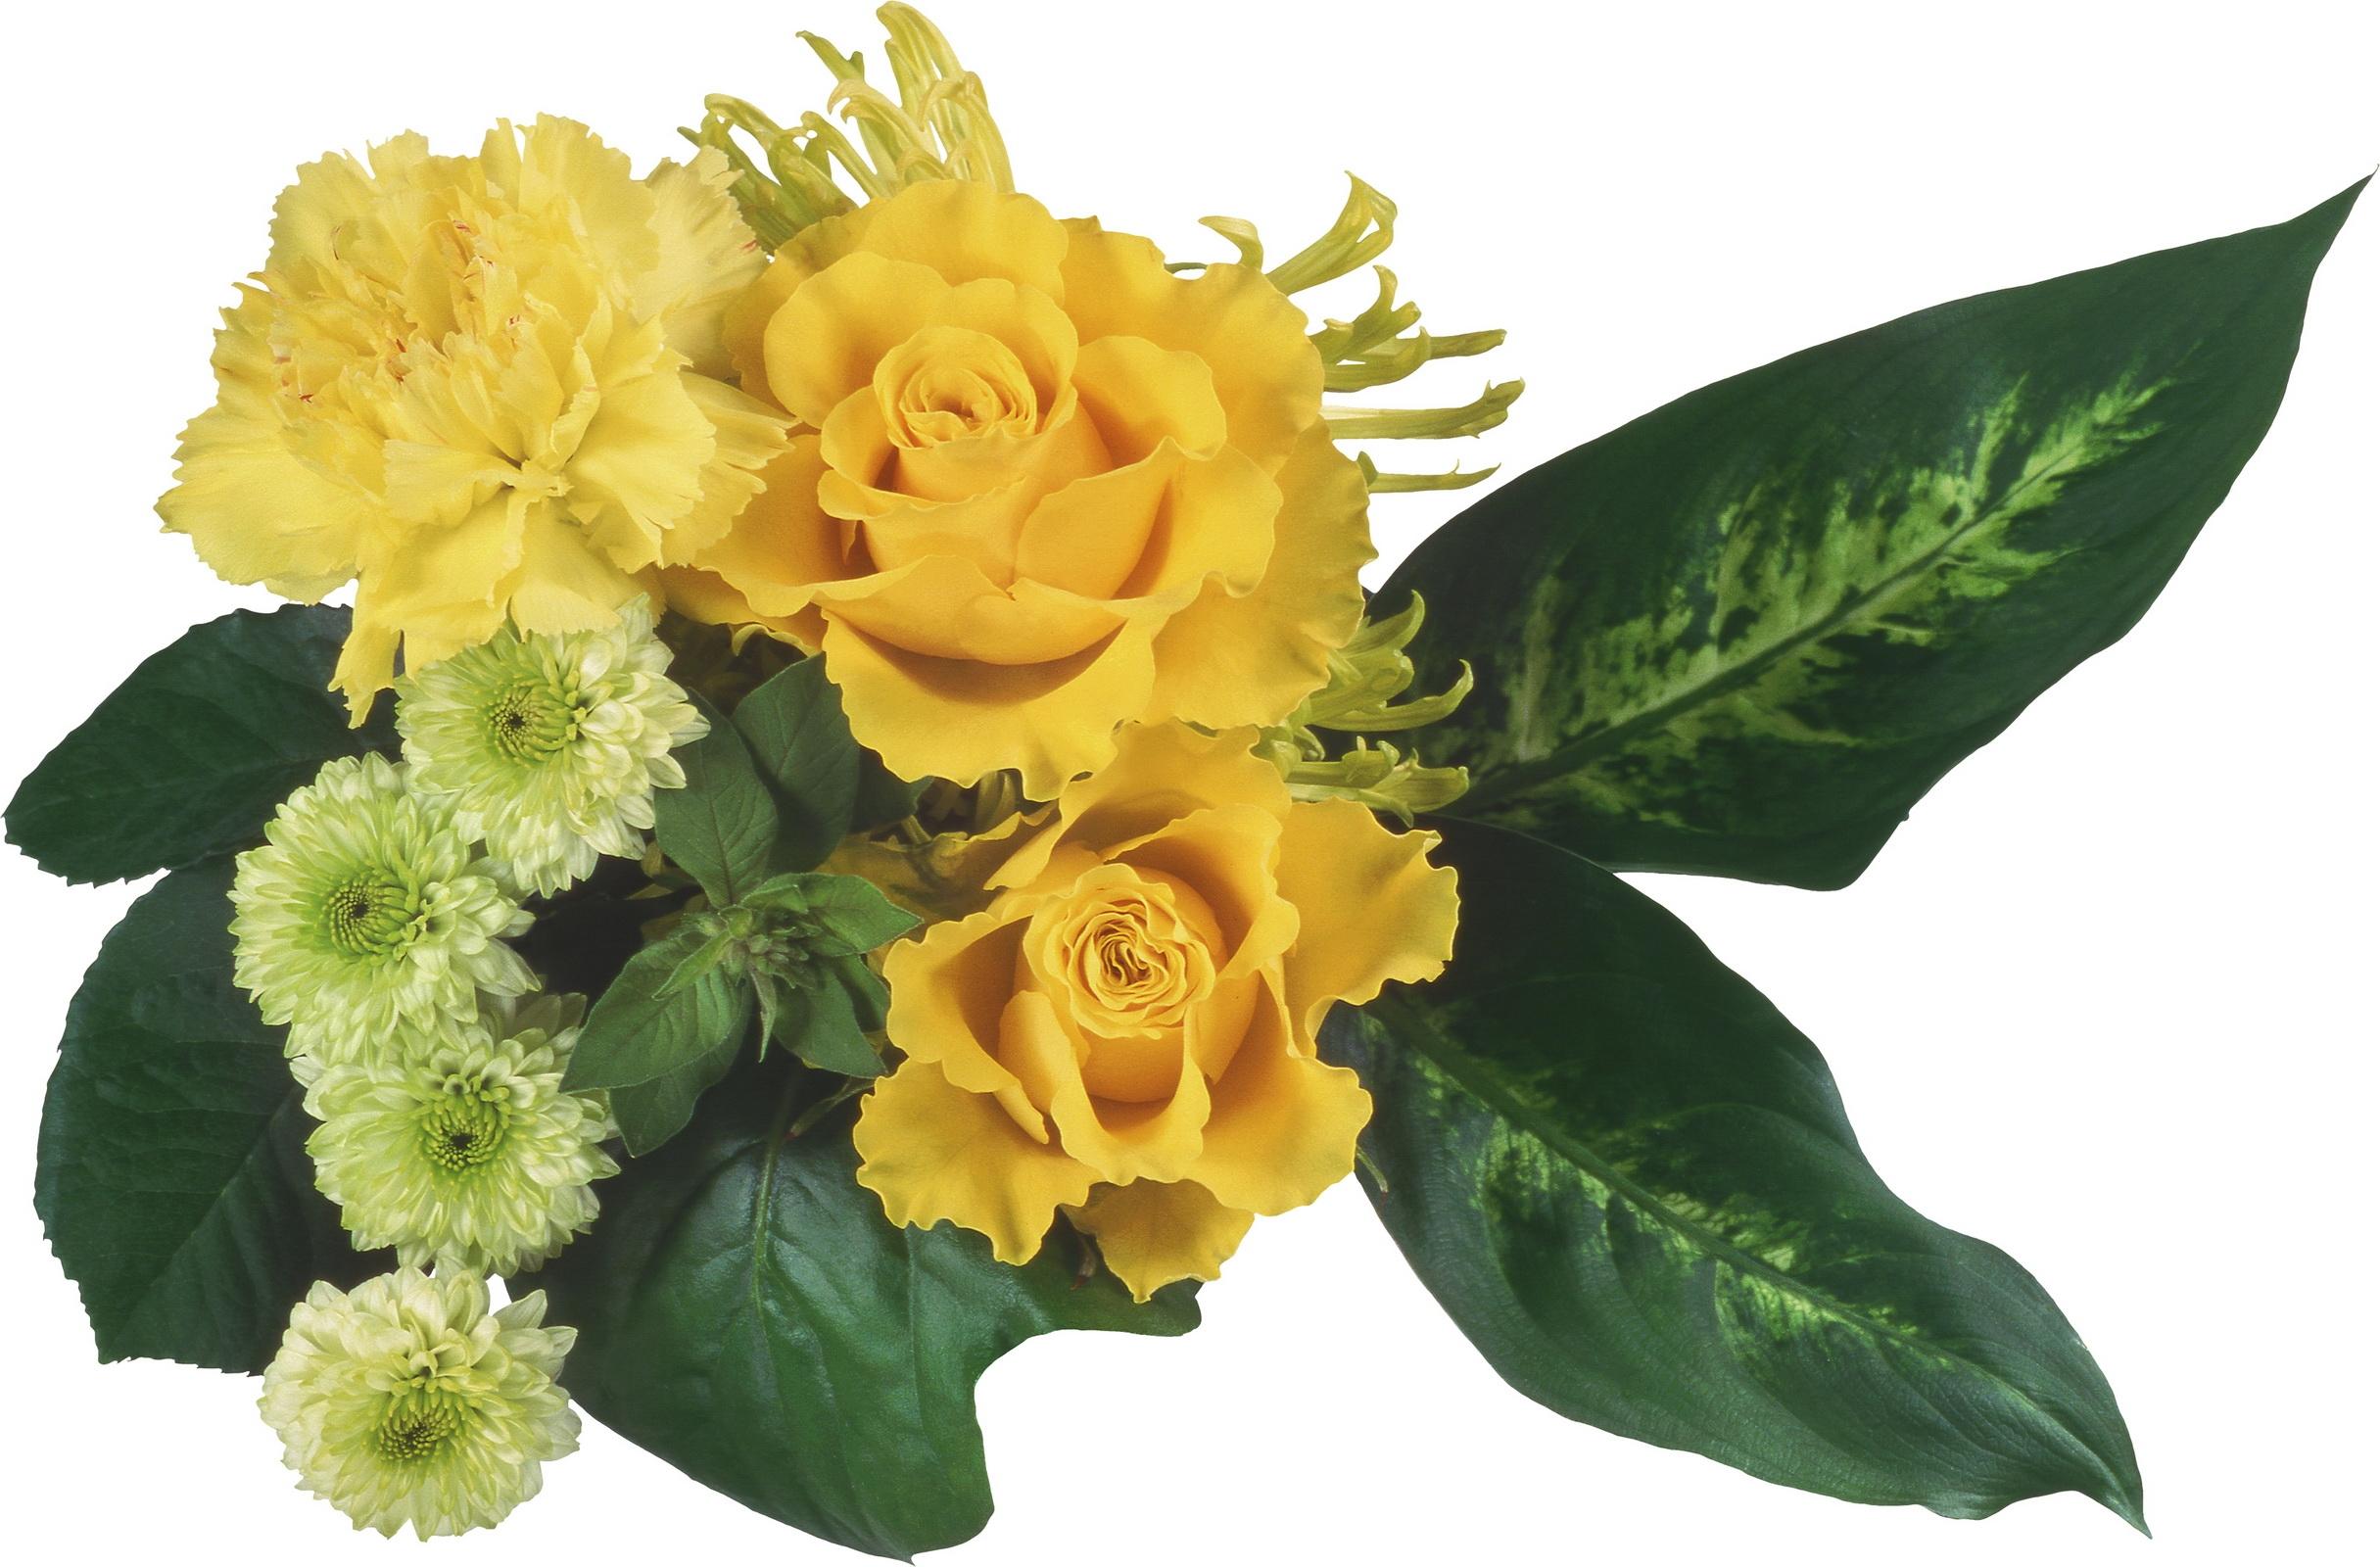 Fondos De Pantalla Hojas Amarillo Crisantemos Flor